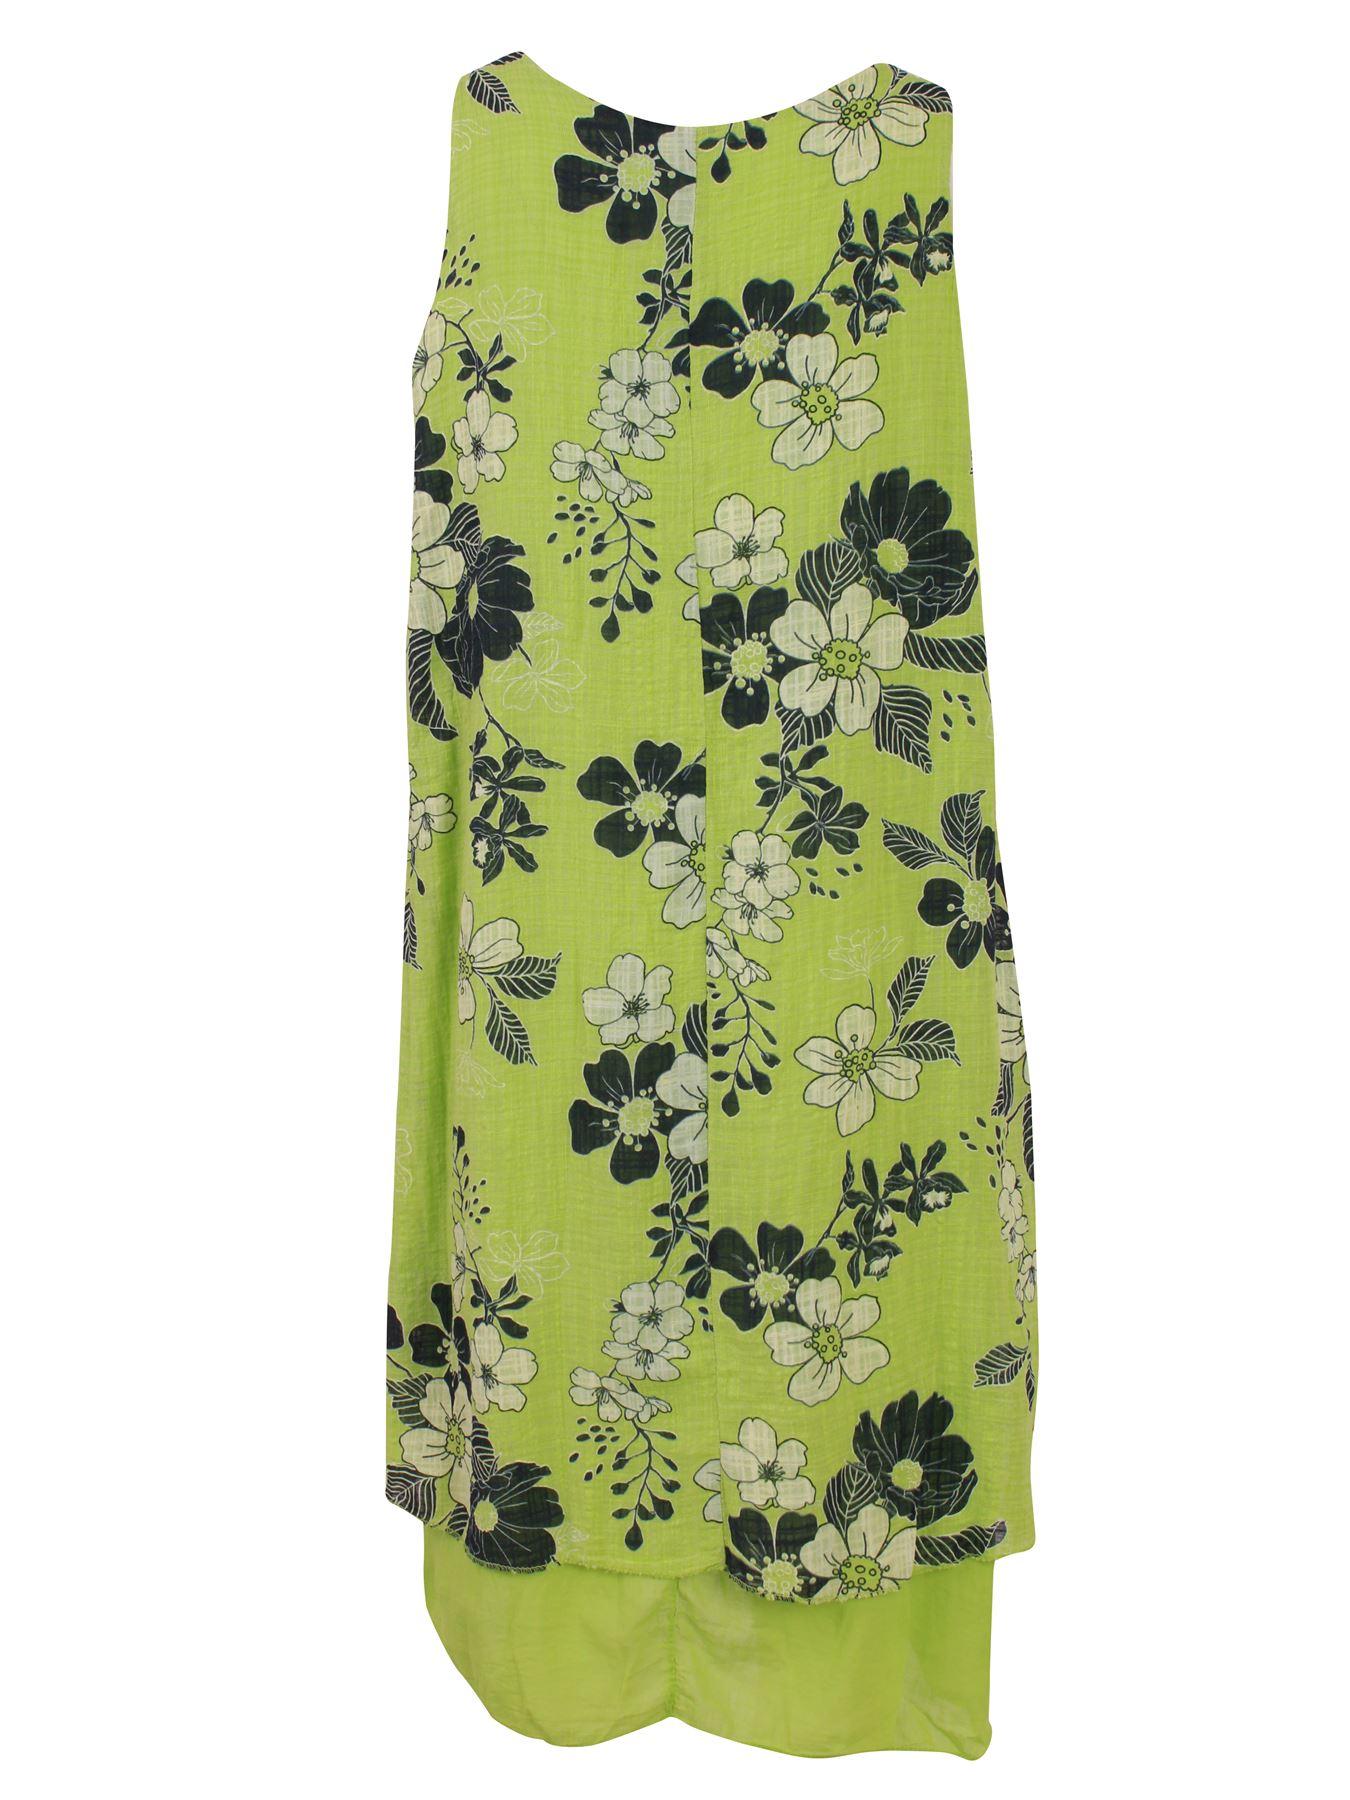 Womens-Floral-Print-Italian-Fashion-Lagenlook-Summer-Cotton-Crew-Neck-Dress thumbnail 21